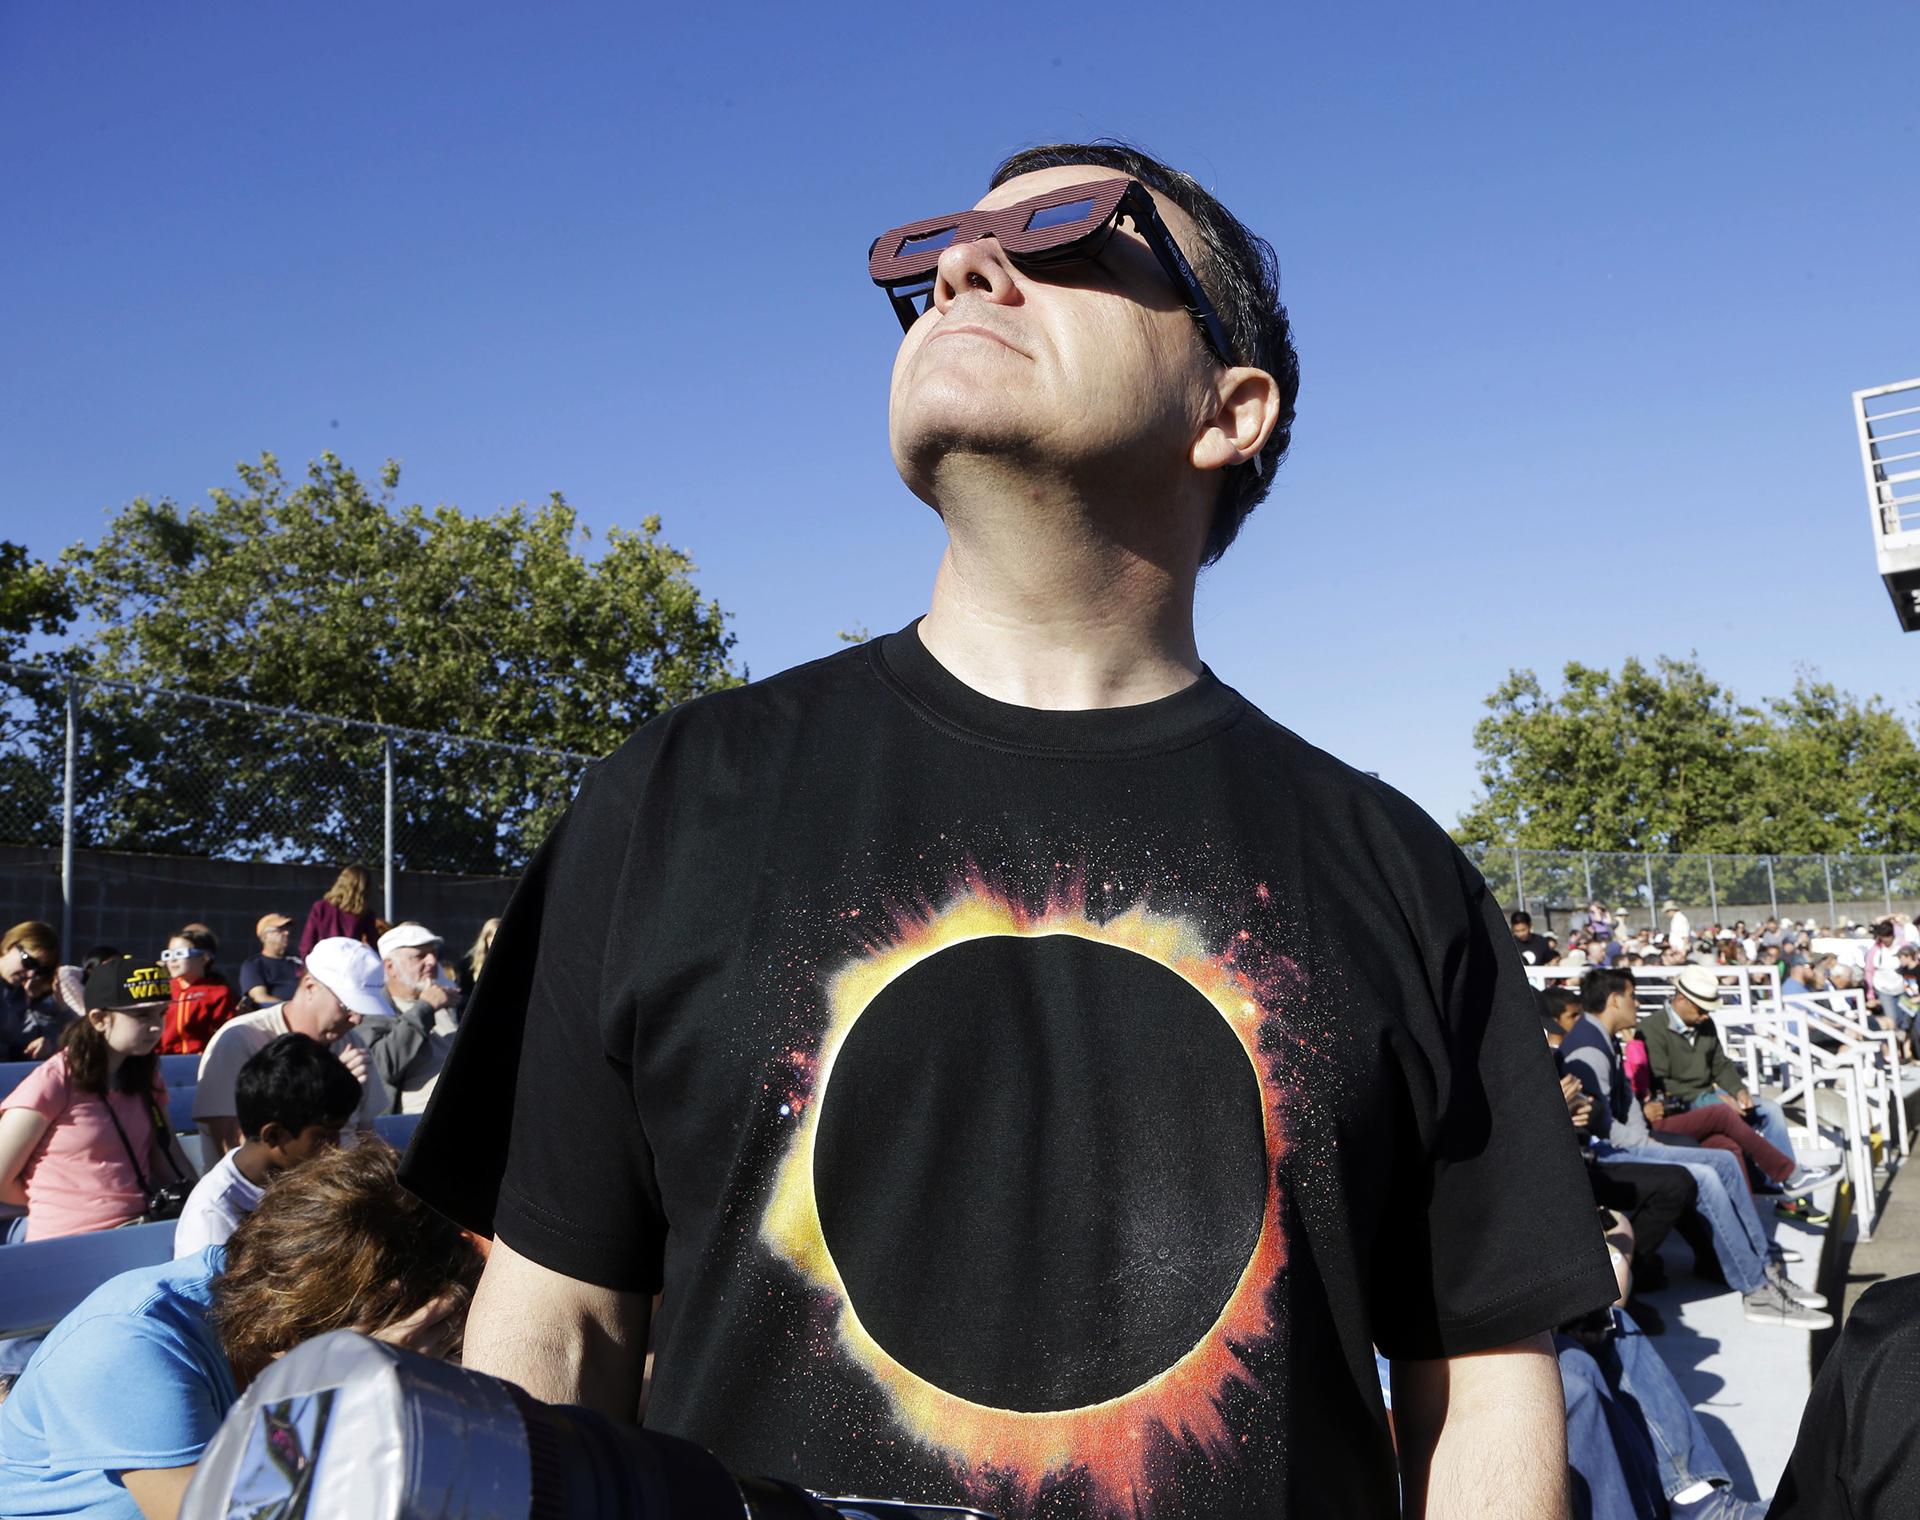 Fotos del eclipse de sol